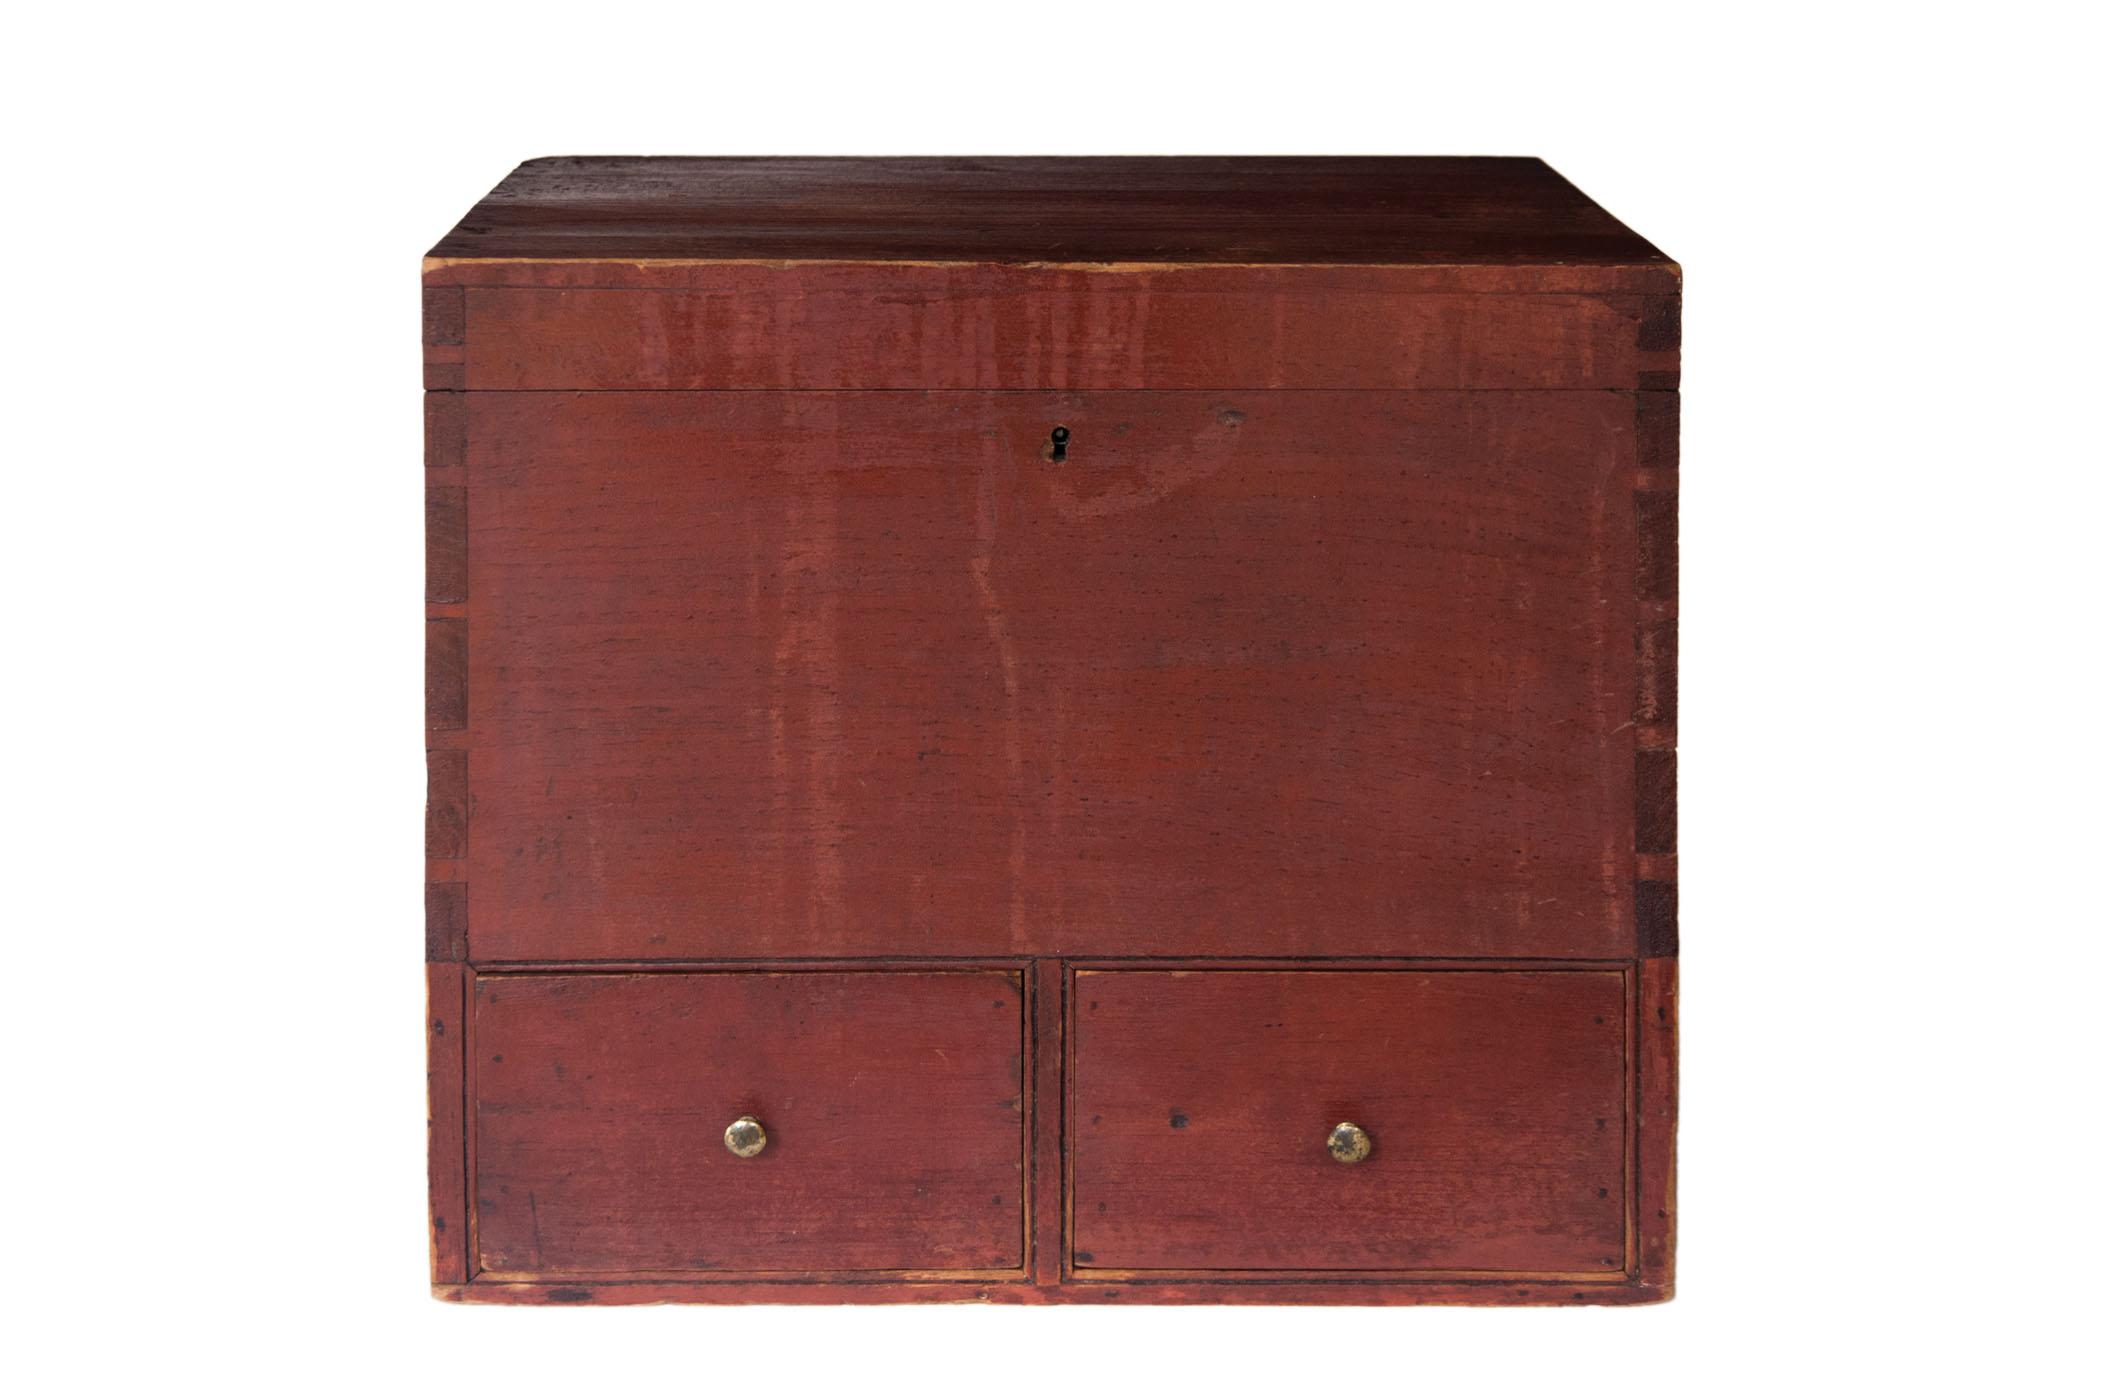 Lot 167 Tall Storage Box  sc 1 st  Willis Henry Auctions Inc. & Willis Henry Auctions Inc.